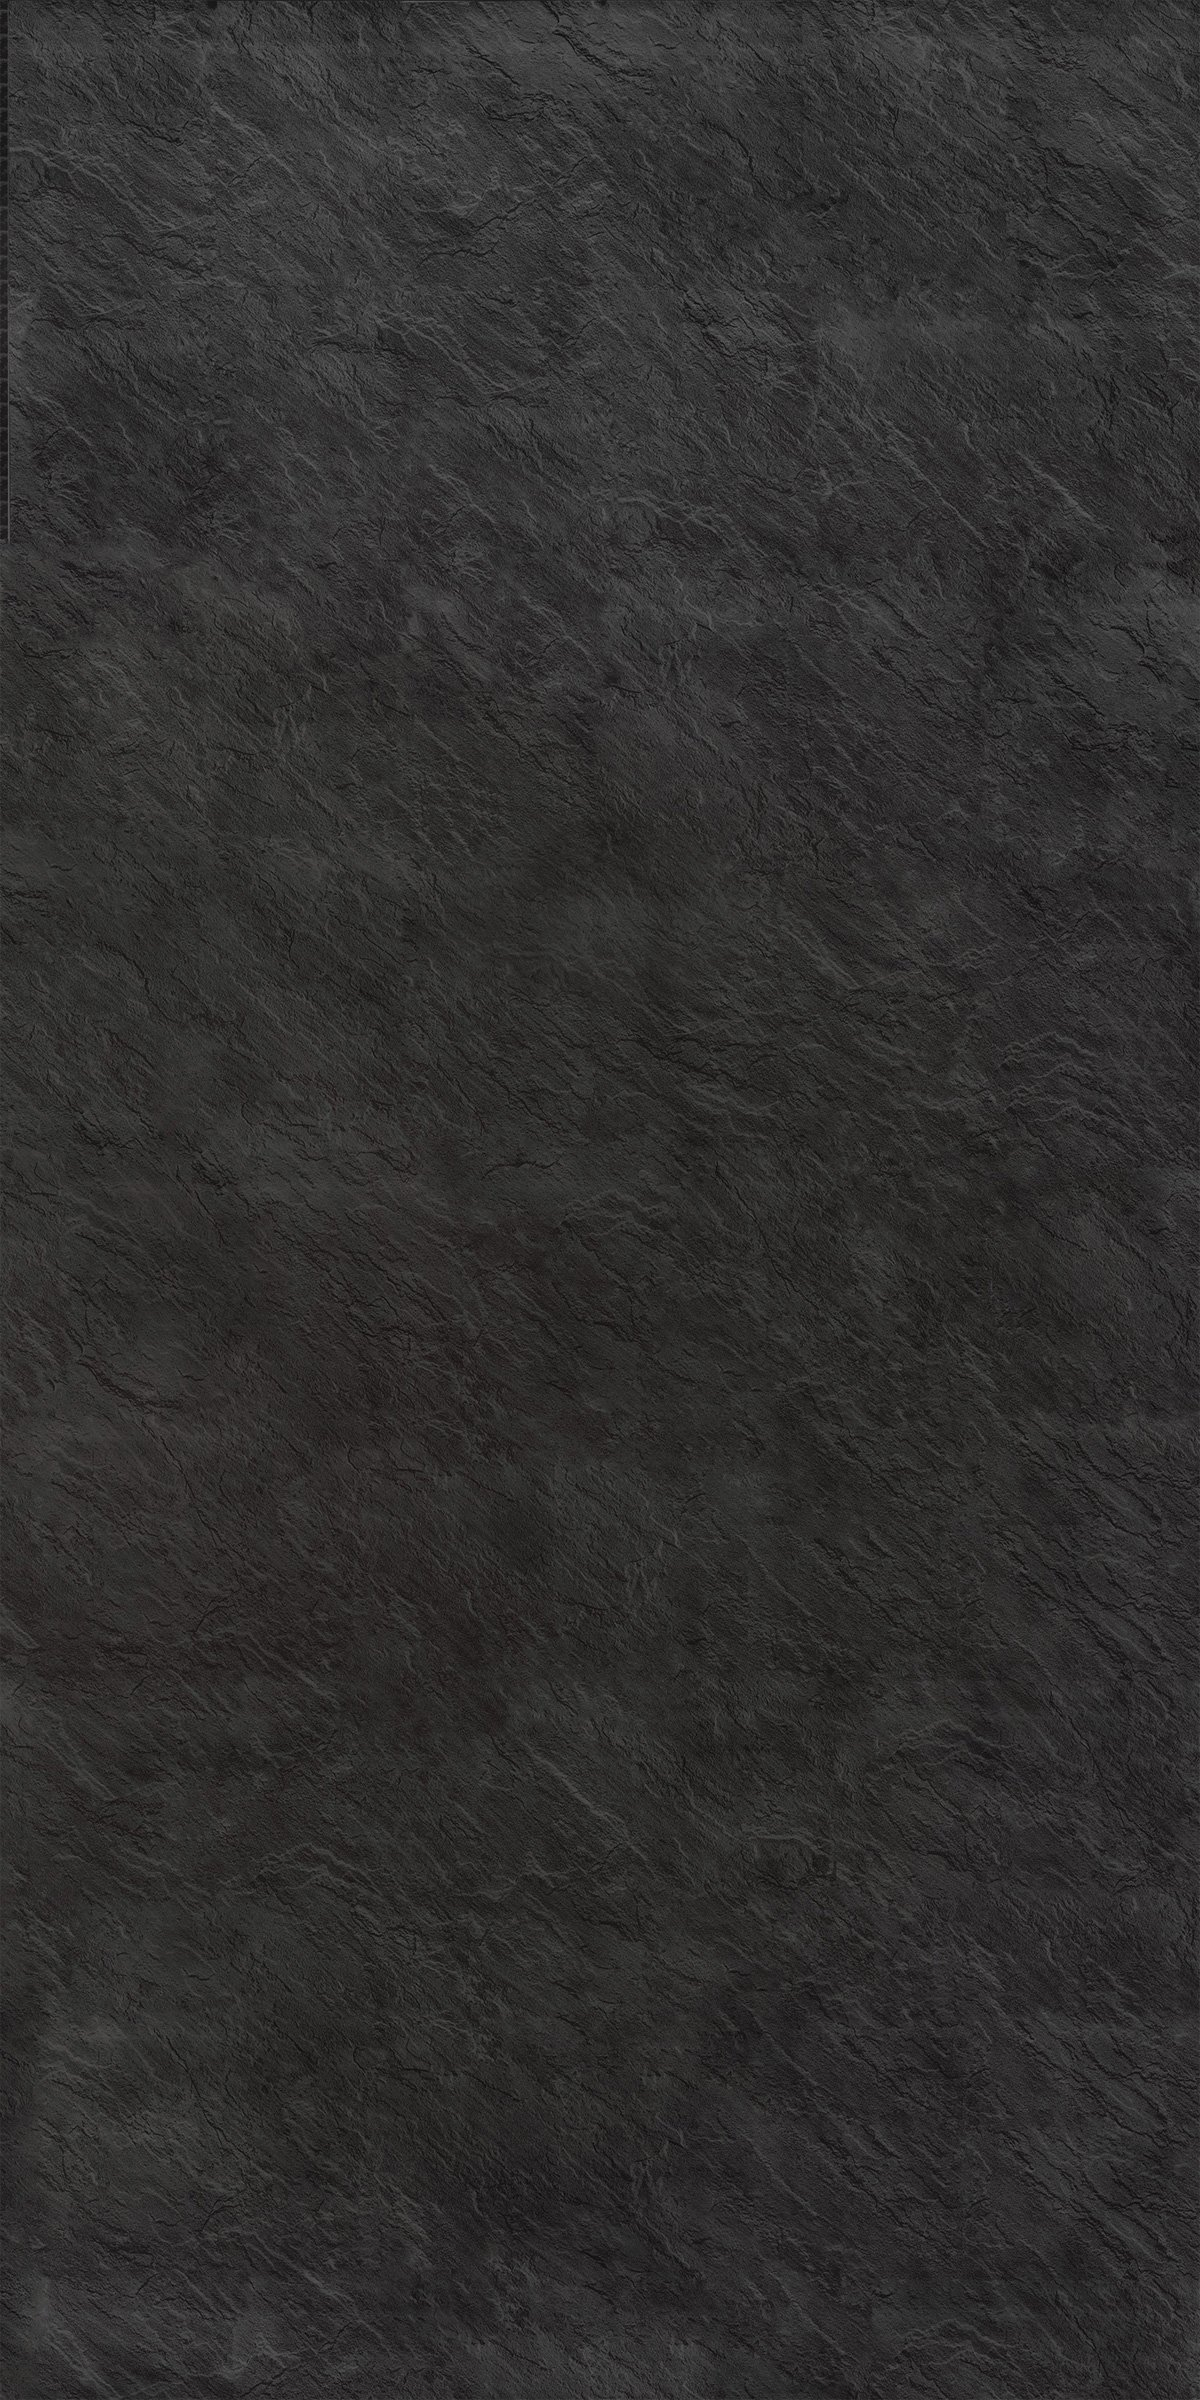 Riven Slate Bathroom Cladding Direct